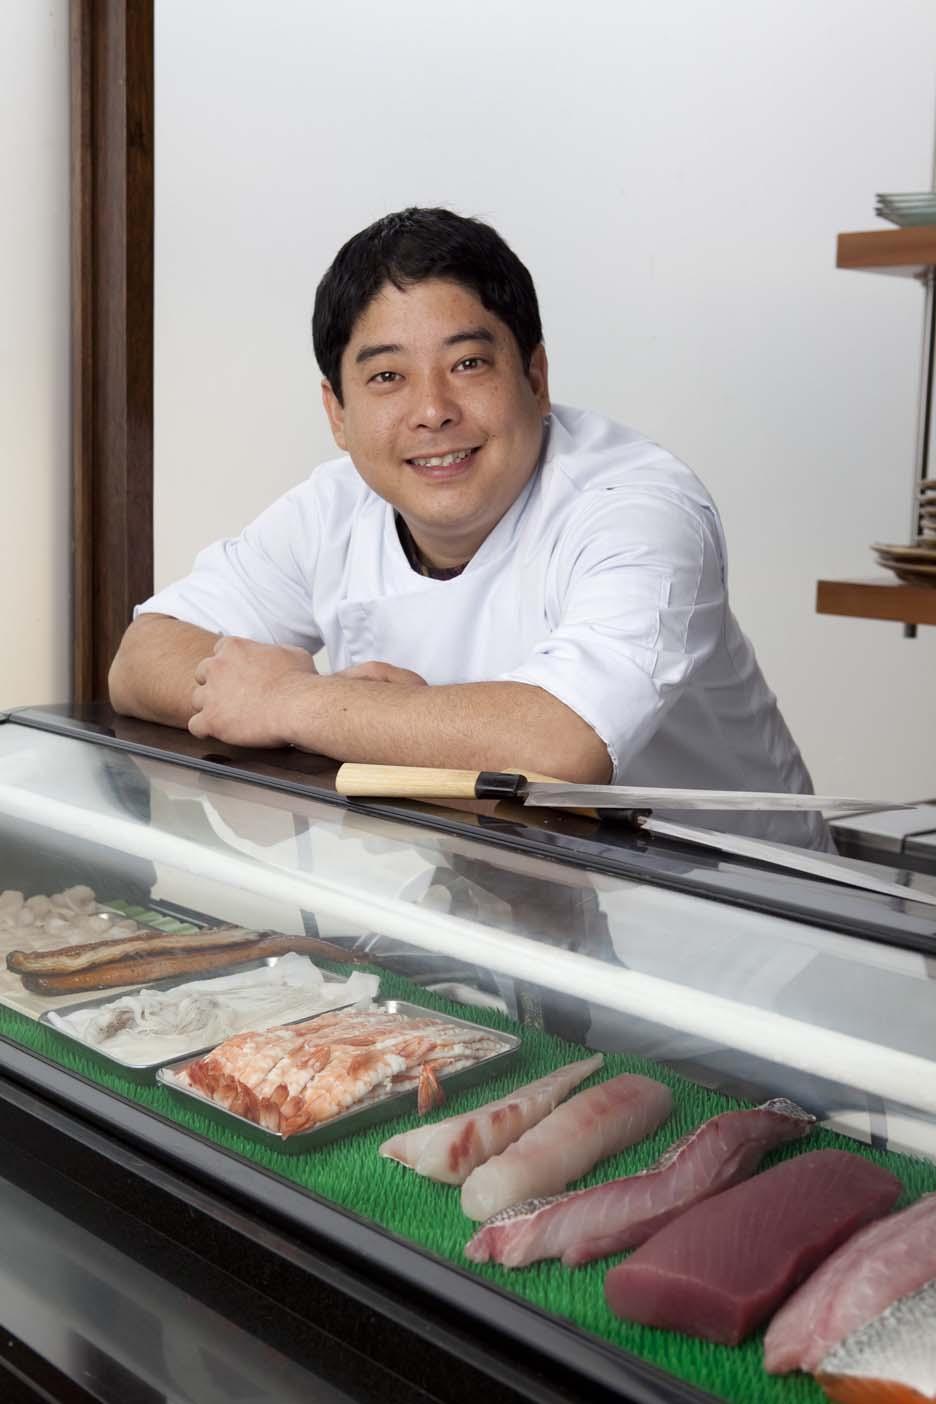 La nueva sangre de la cocina nikkei peruana  Descubra a los Nikkei